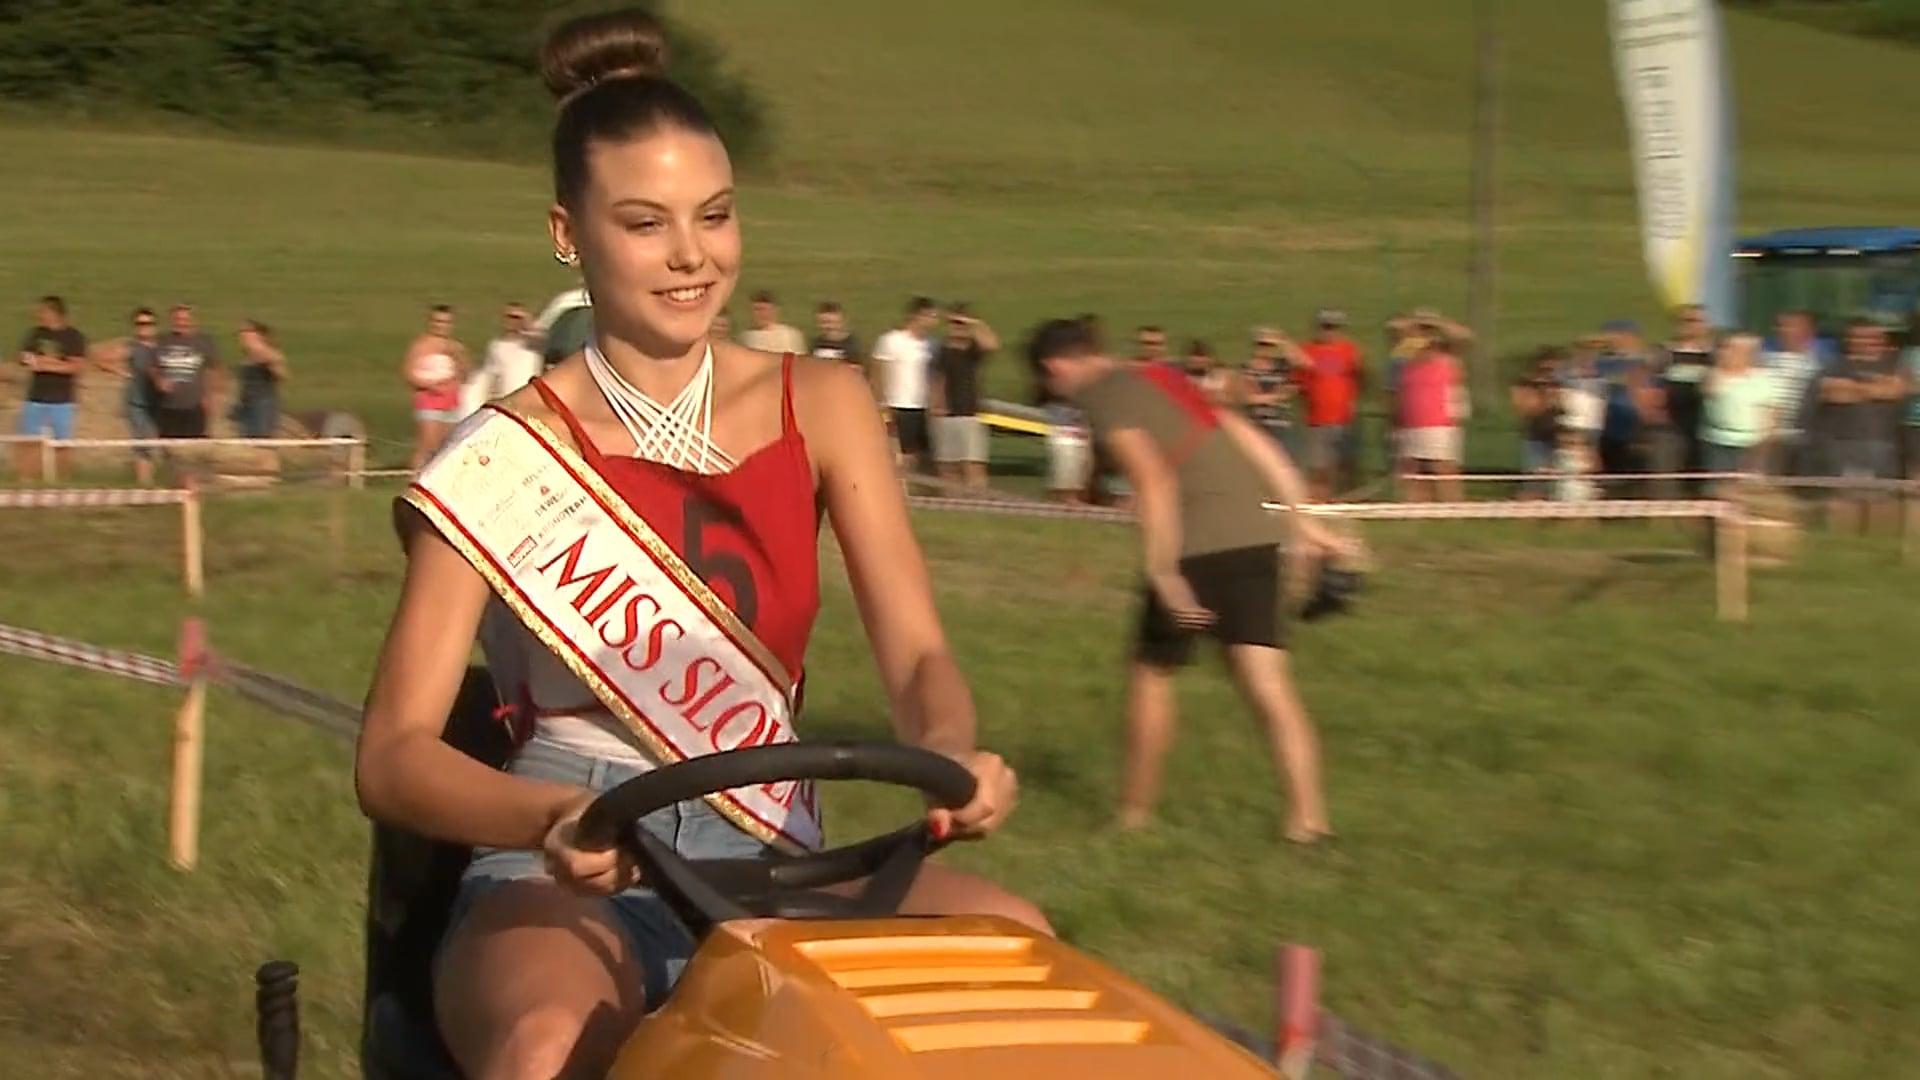 V Jarenini je dirkala tudi Miss Slovenije